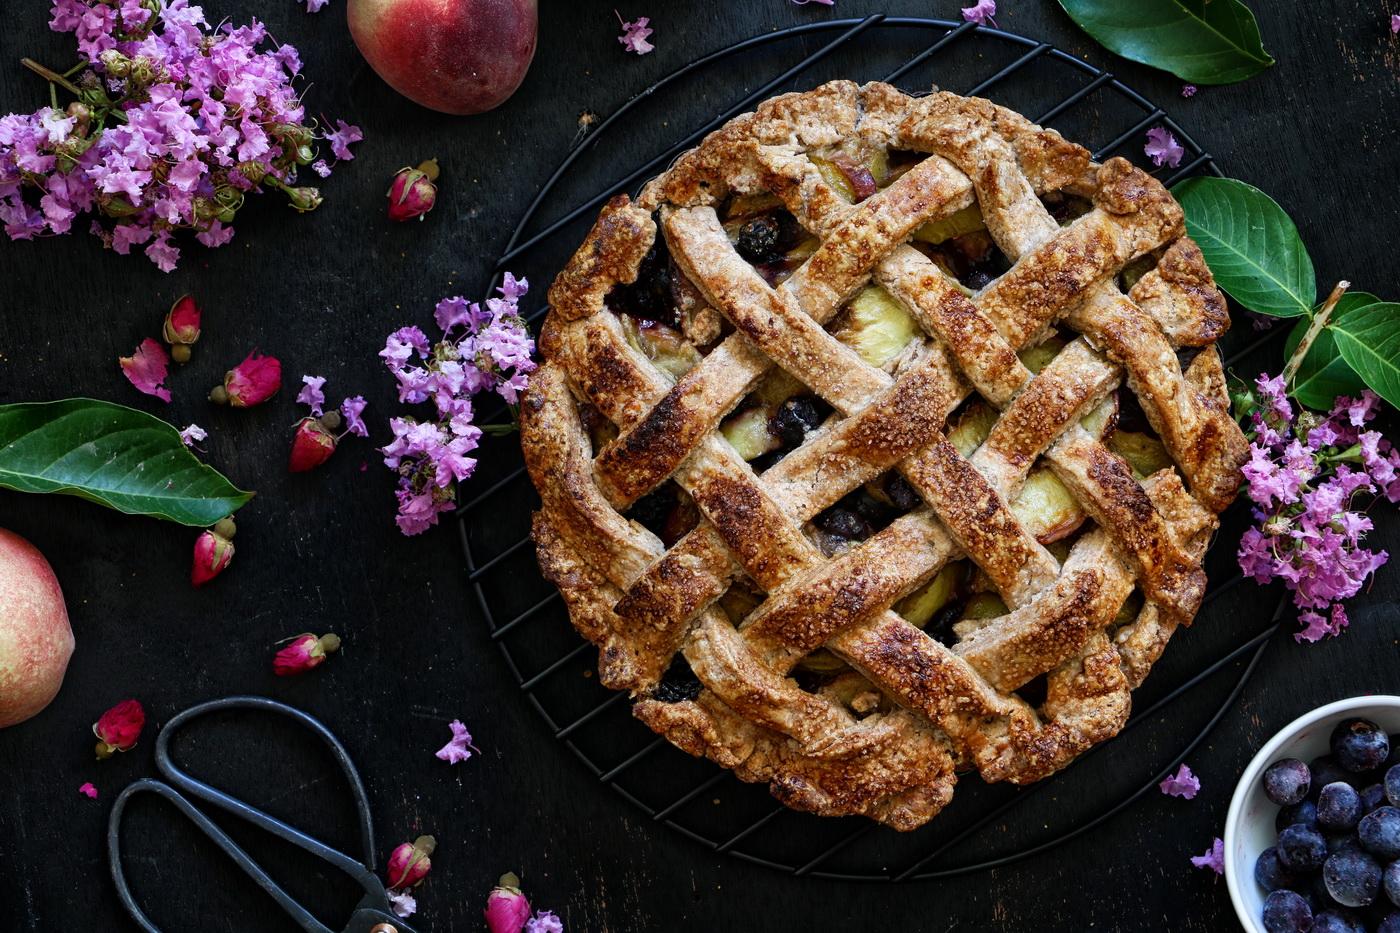 Vegan Peach and Blueberry Pie